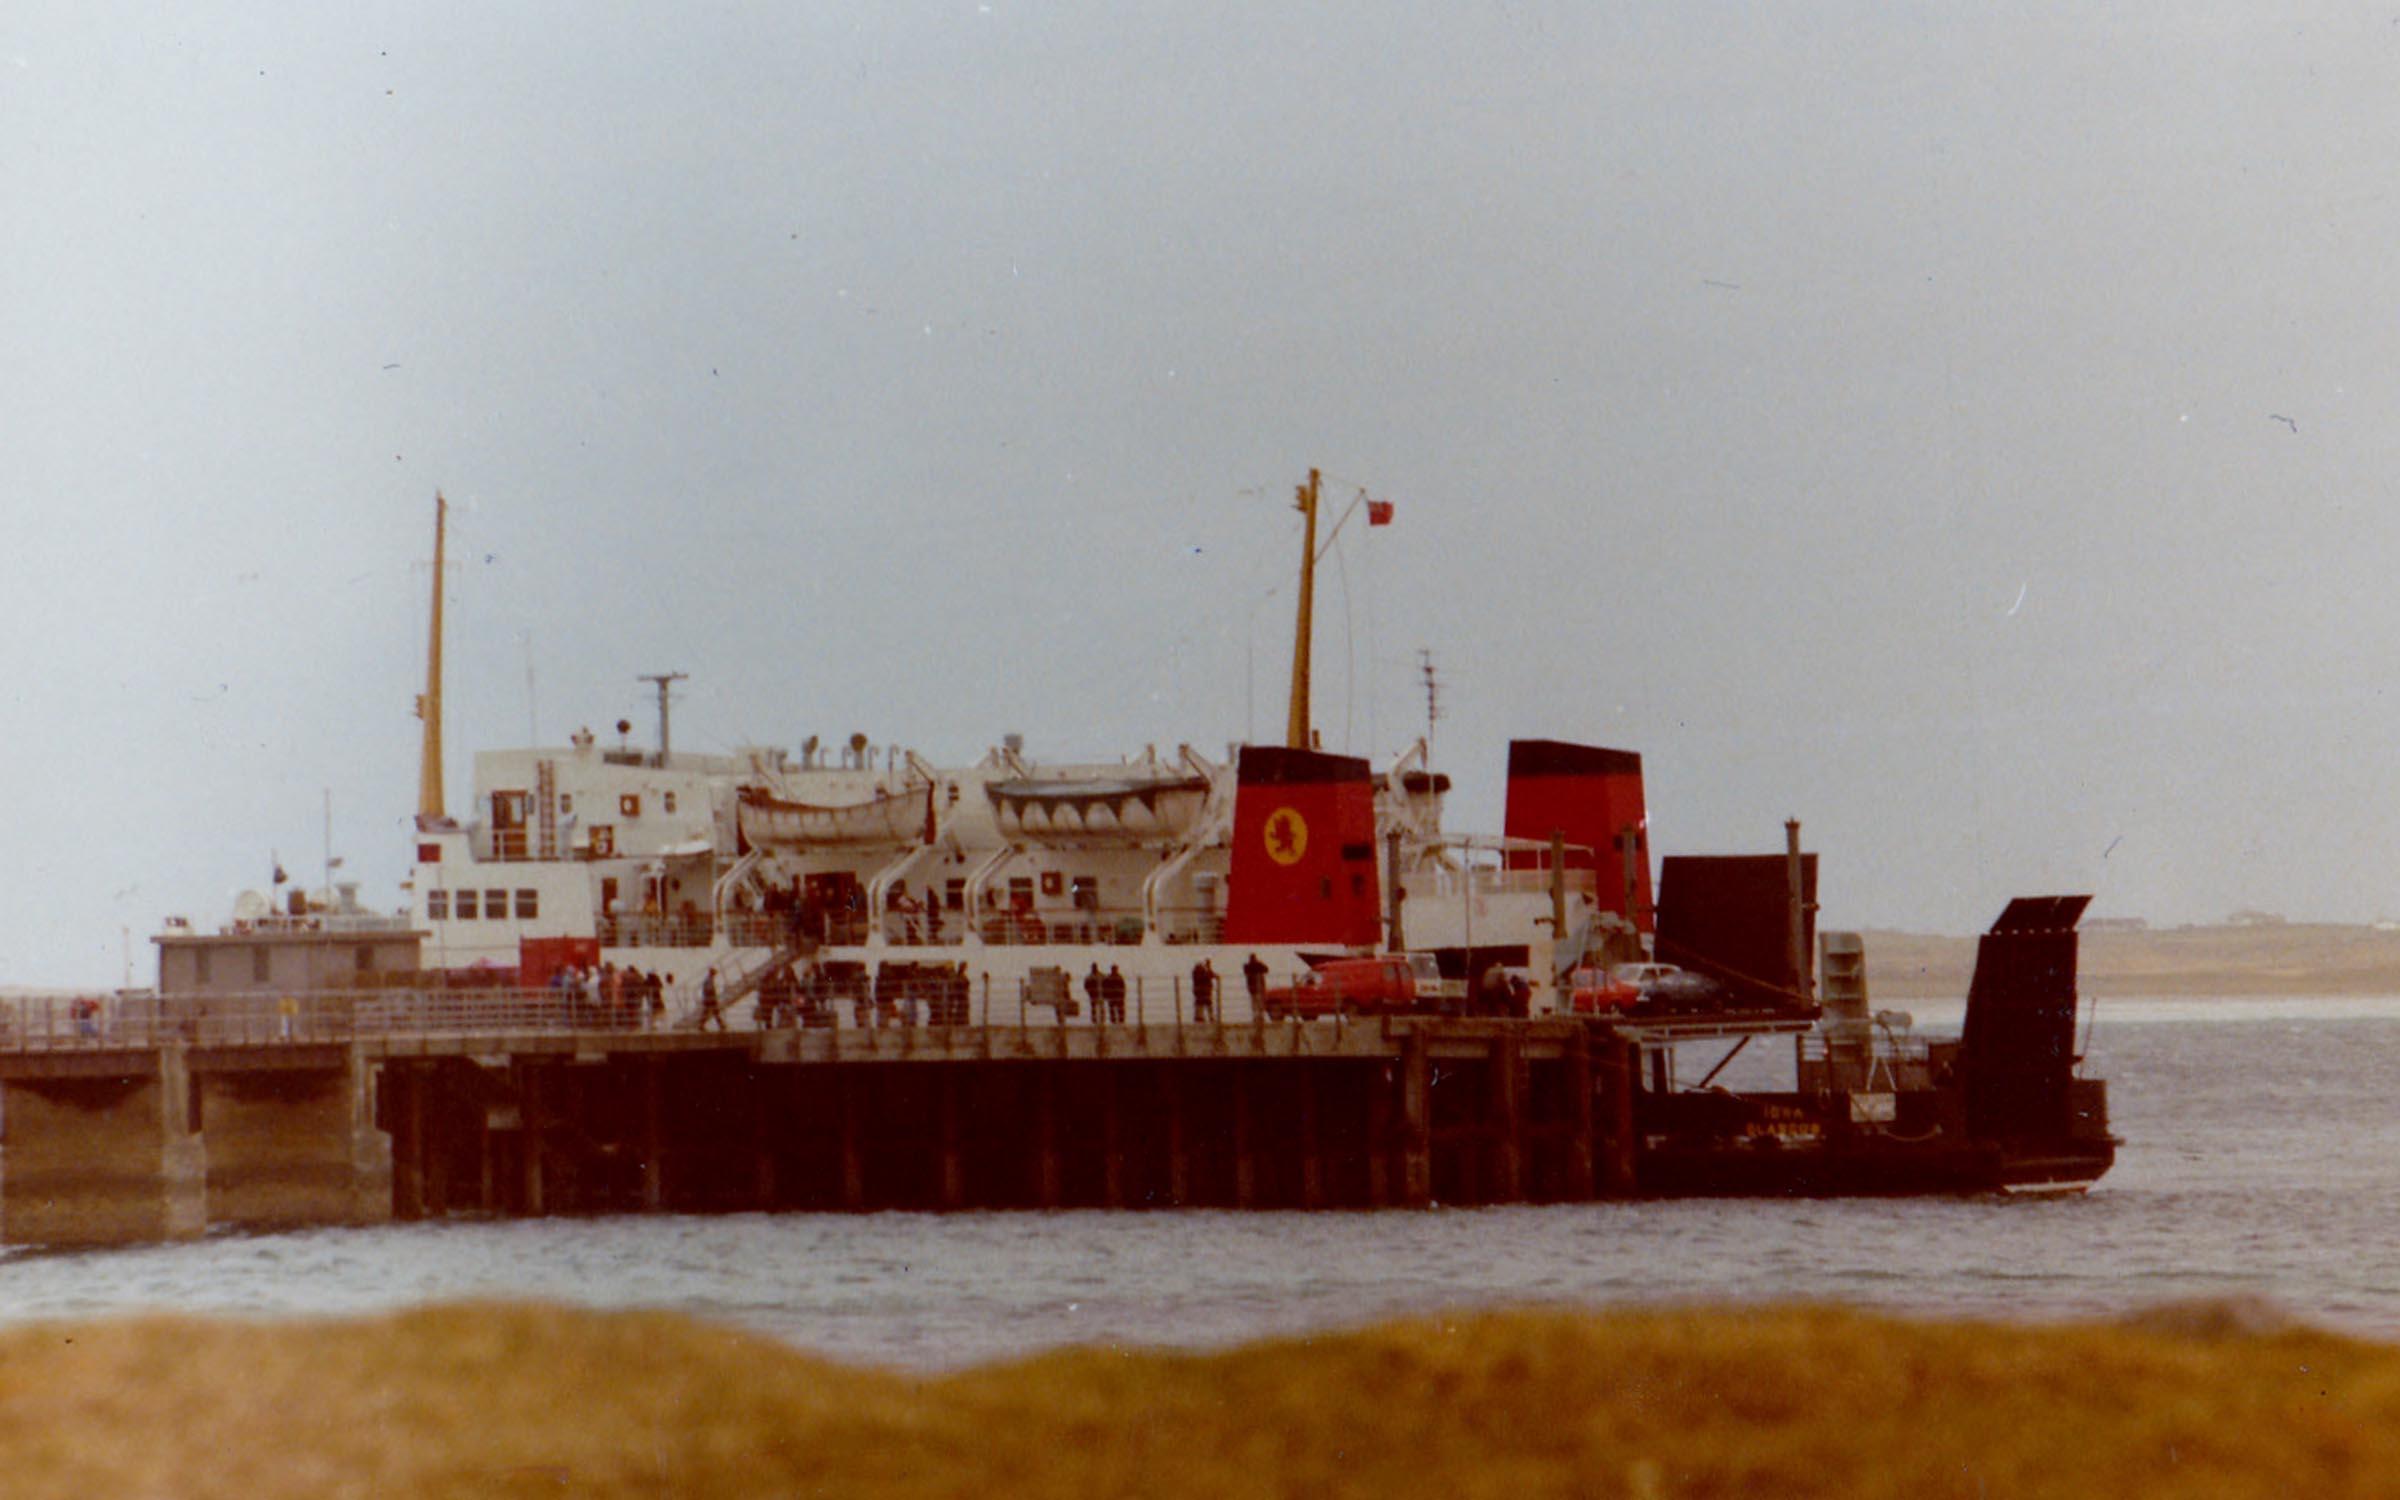 Iona hoist-loading at Tiree (Jim AIkman Smith)